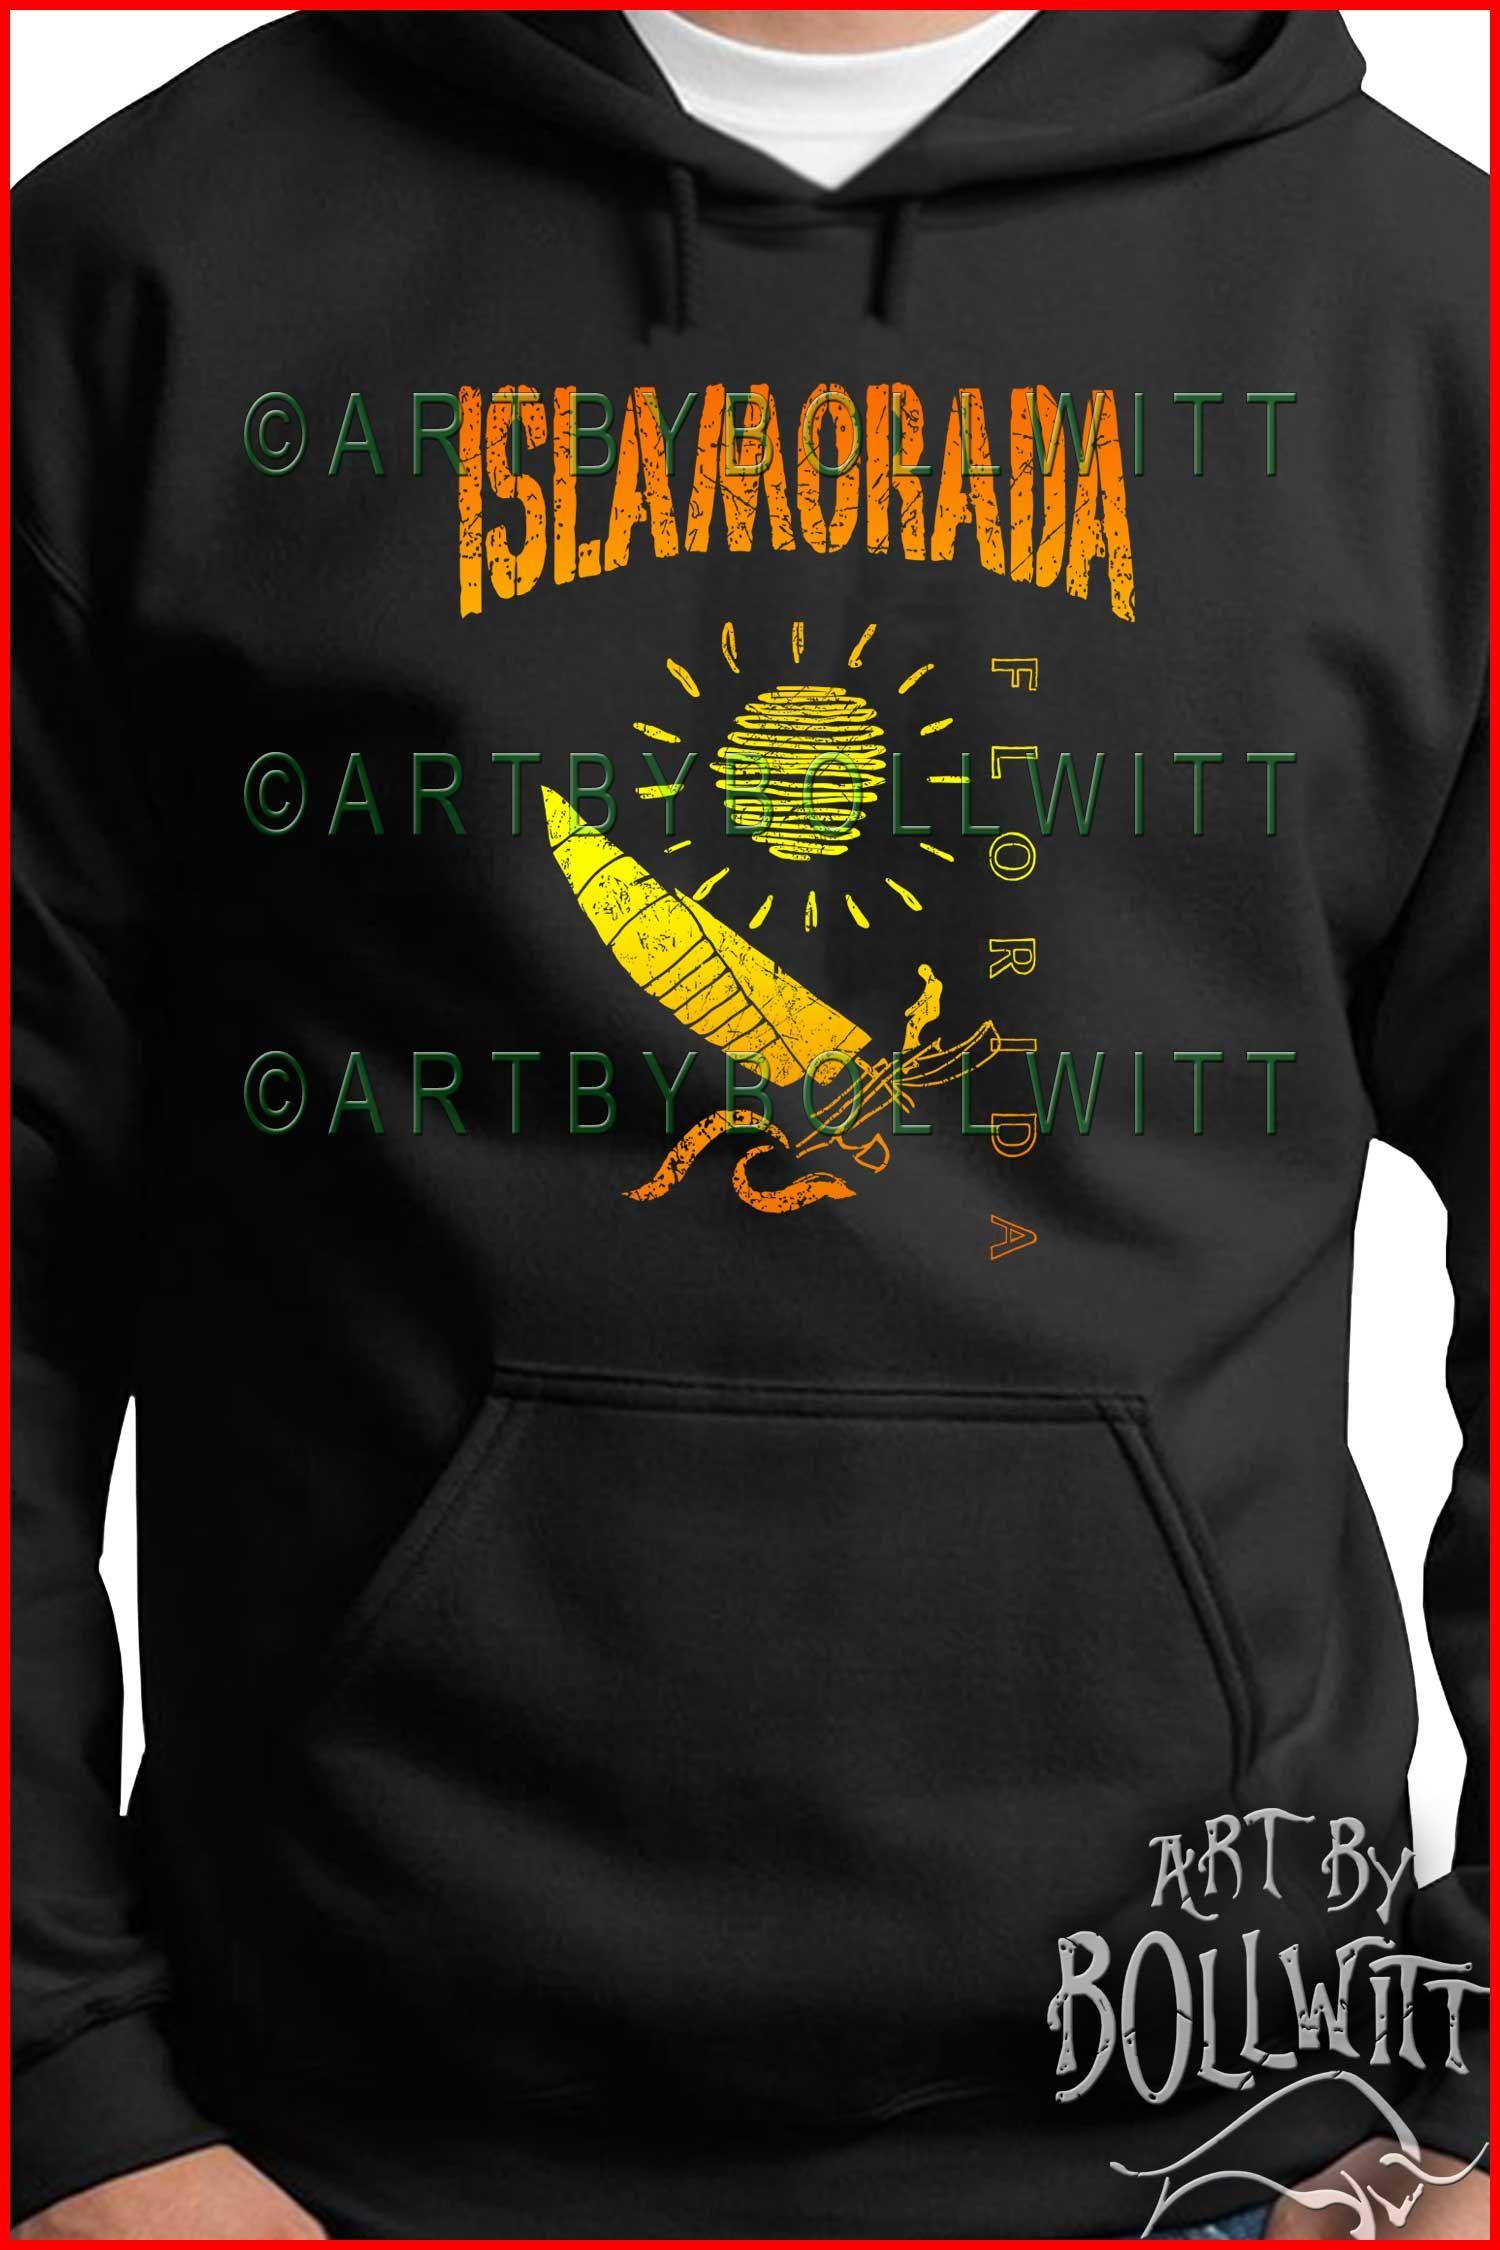 'Islamorada Florida Sailing Gift Souvenir, Hobie Cat